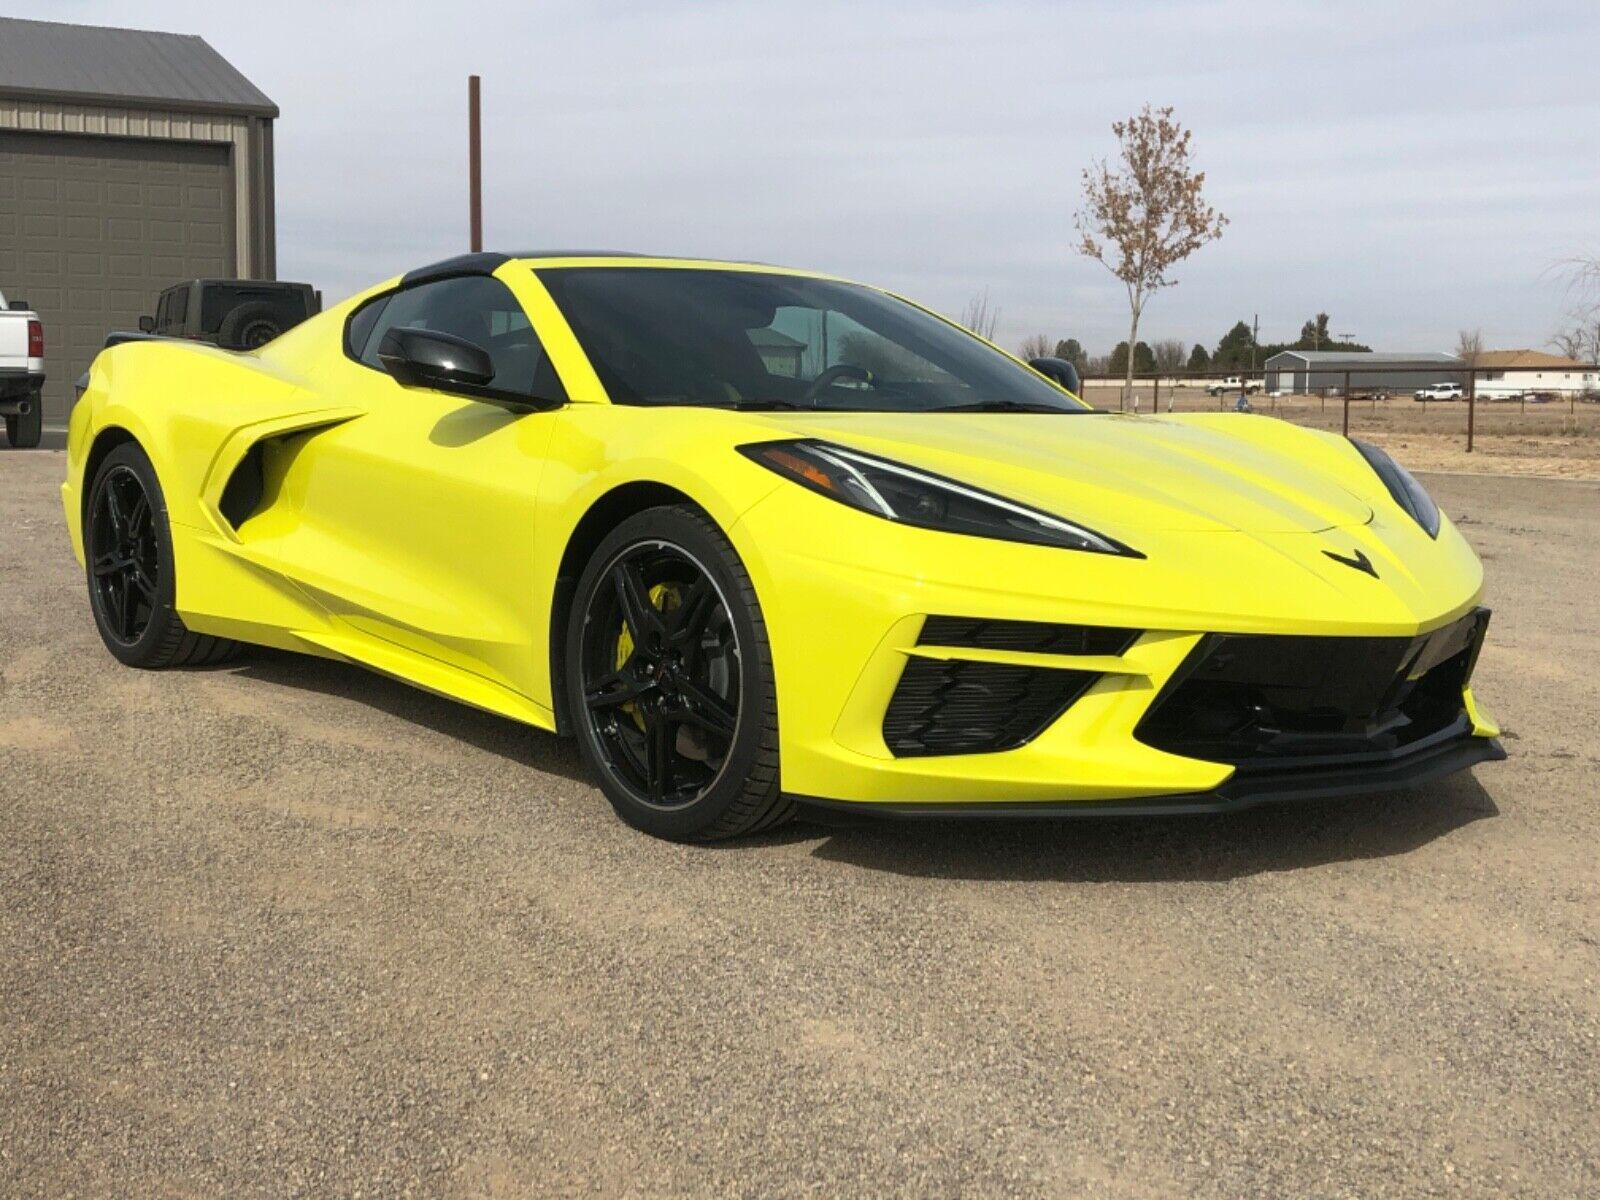 2020 Yellow Chevrolet Corvette  Z51   C7 Corvette Photo 1